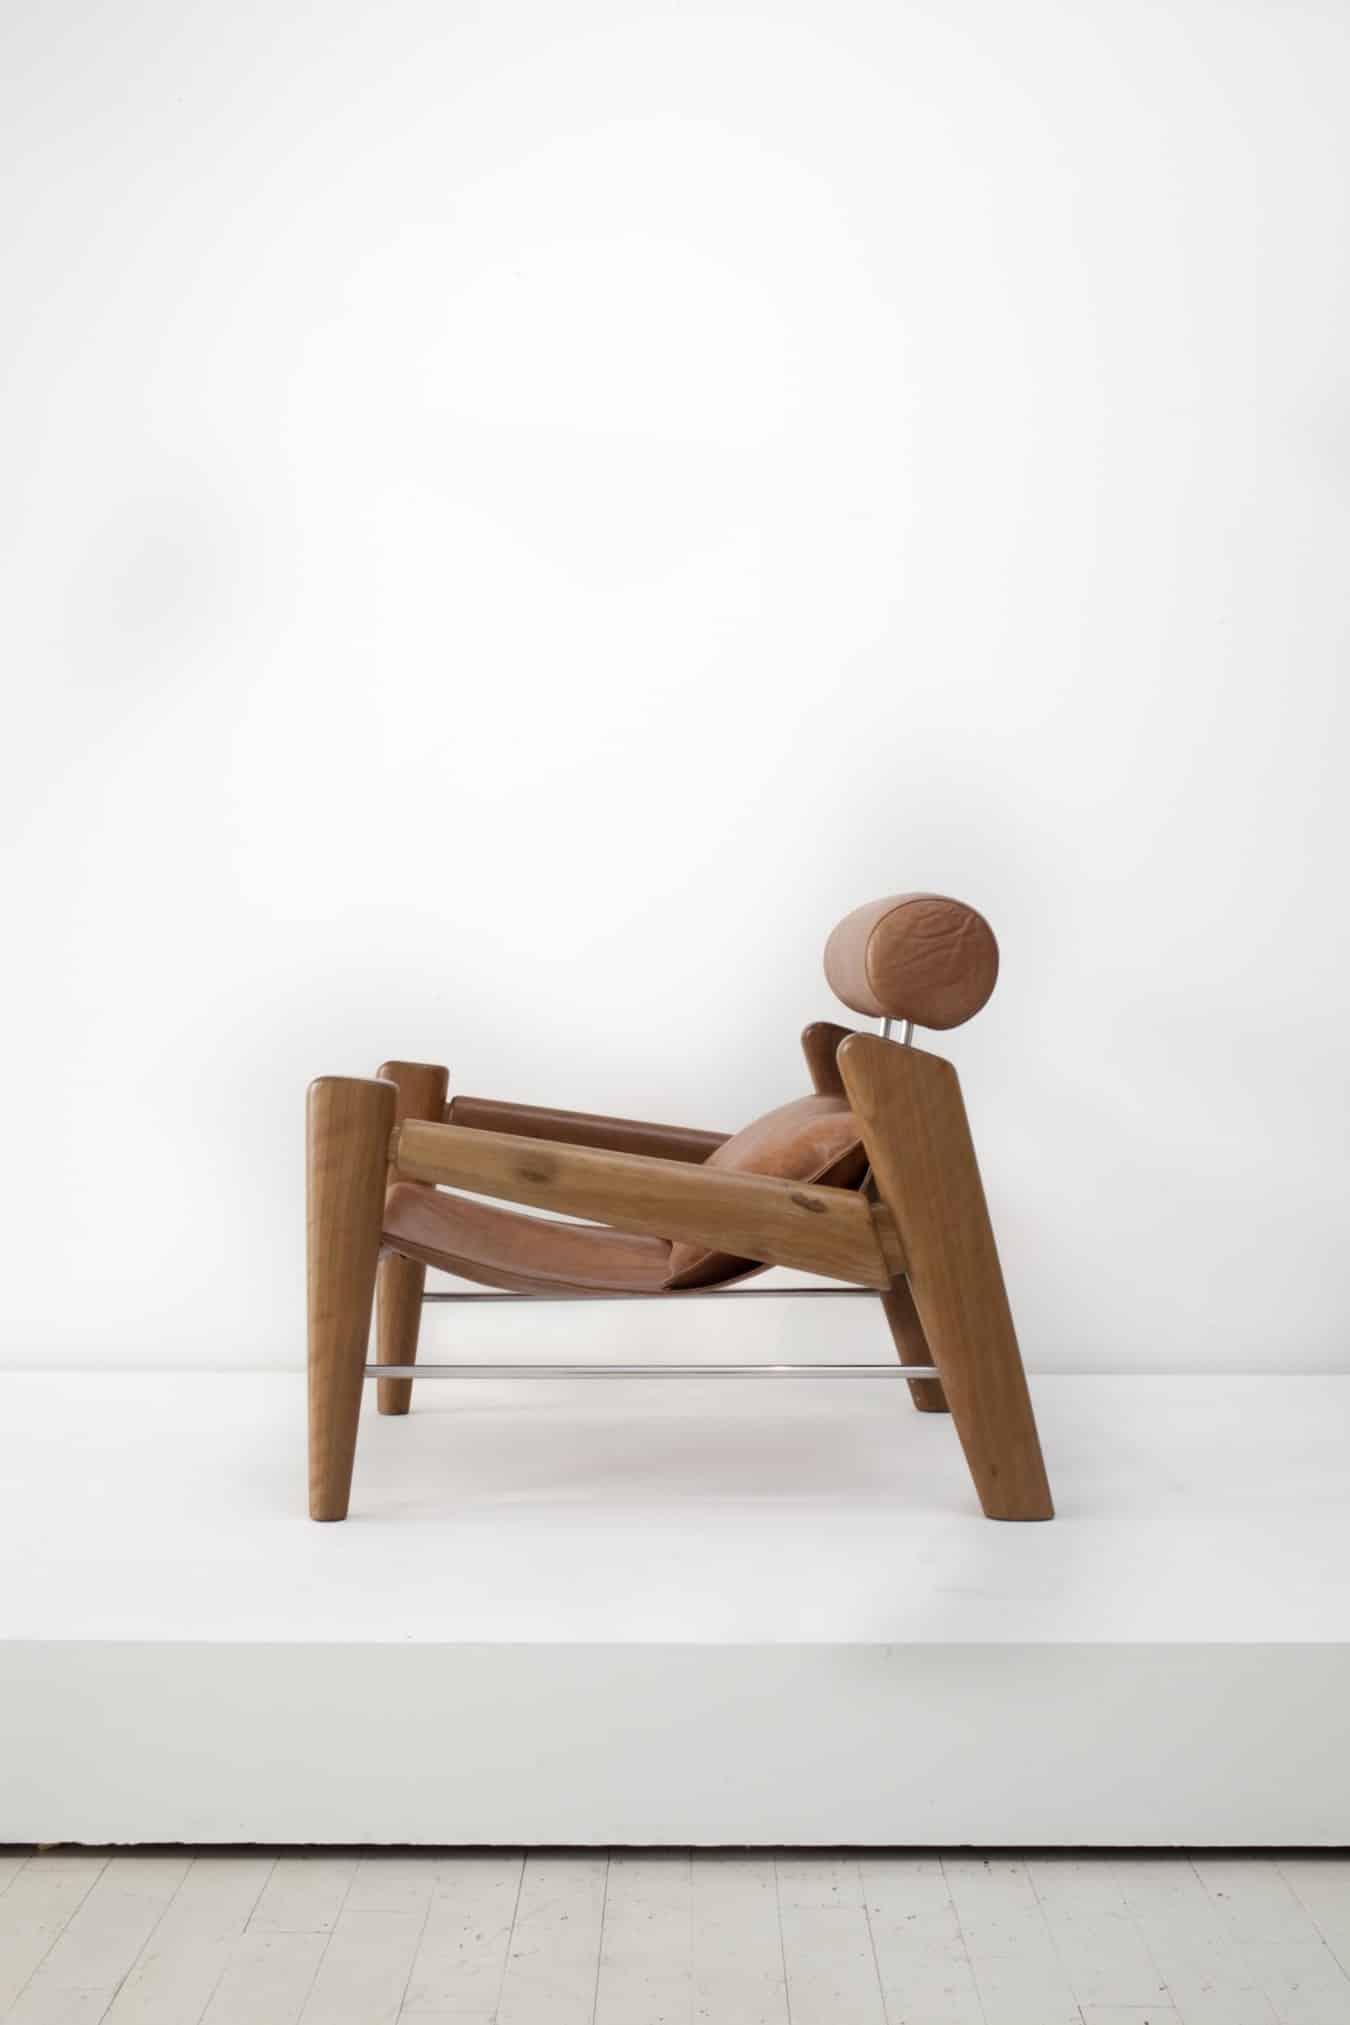 Cadeira Zanine de Zanine - Poltrona de Zanini de Zanine é selecionada para a Design Currents